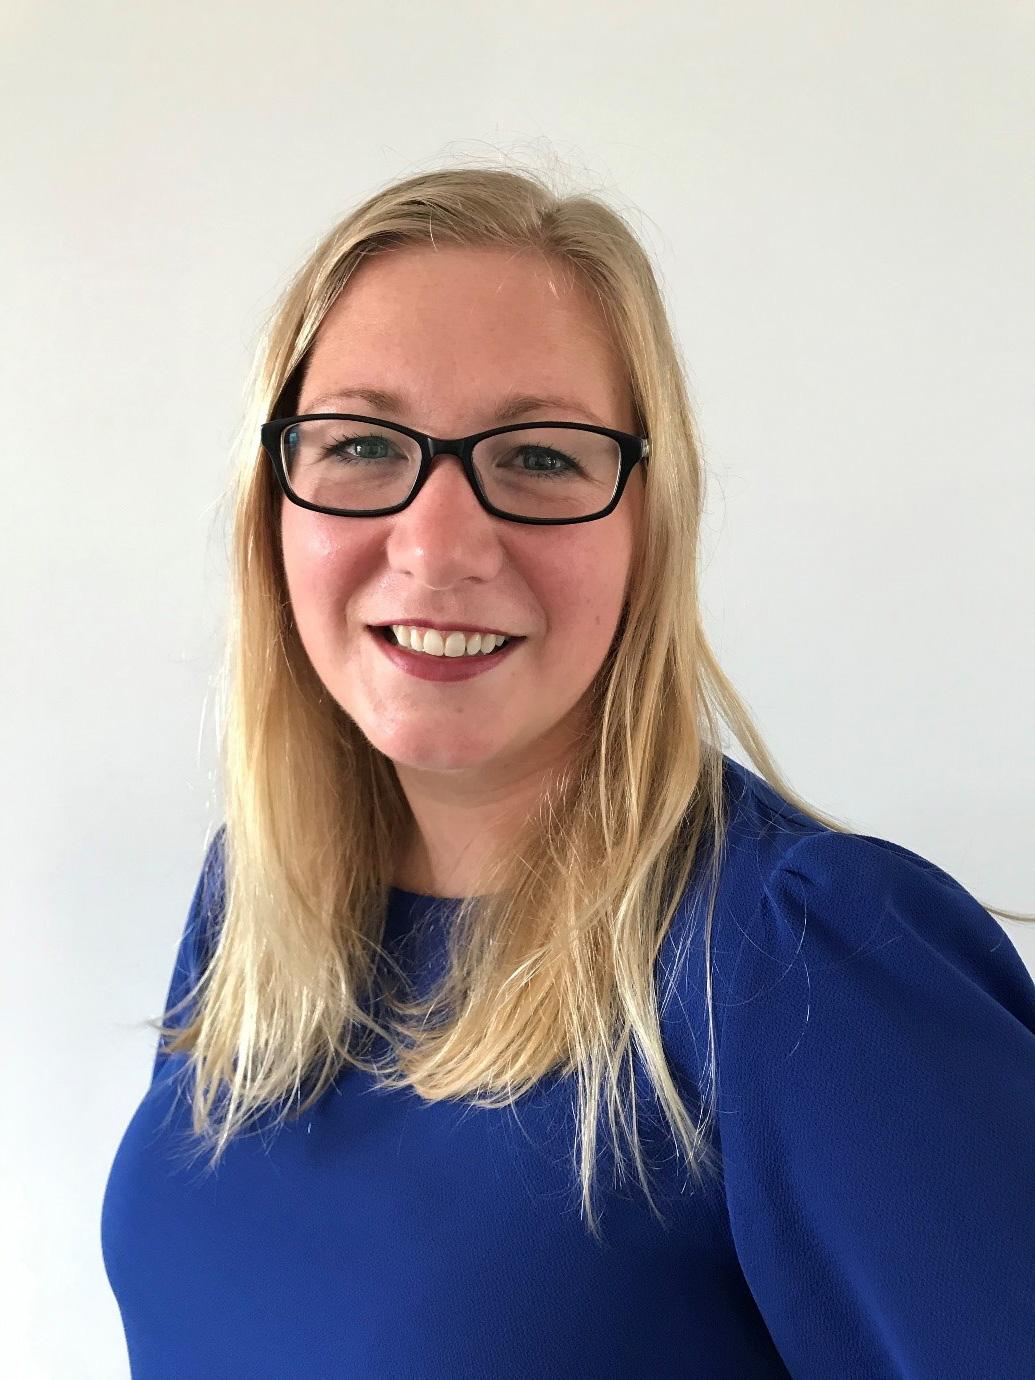 Dr Susan Kohlhaas